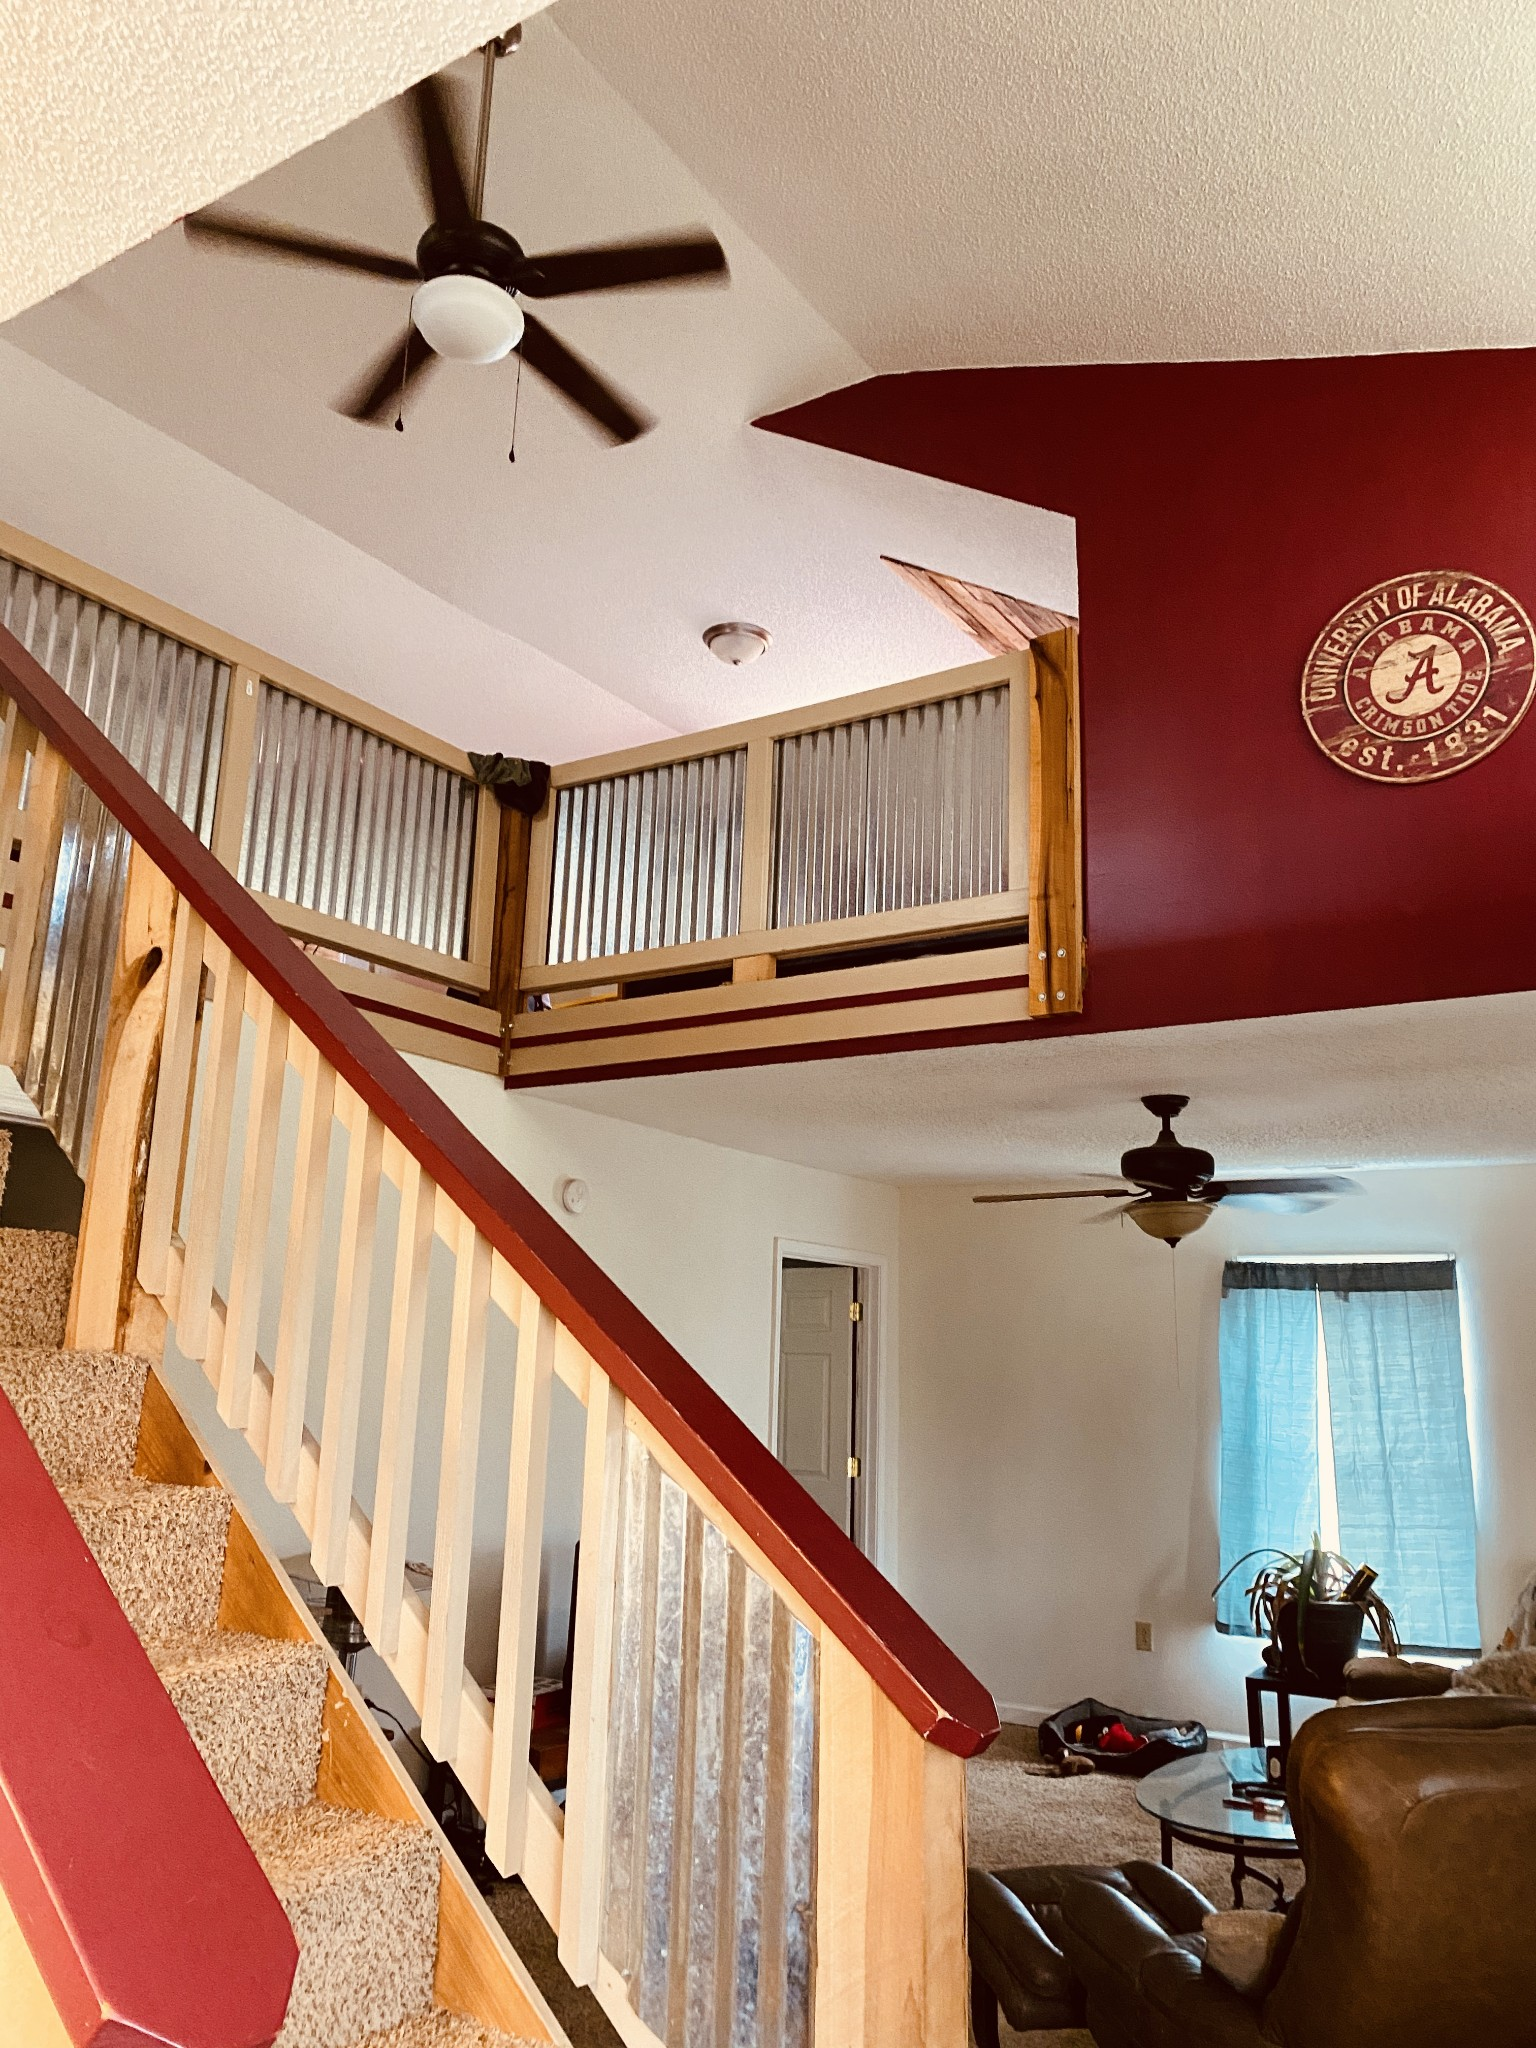 248 Cherry Hollow Rd Property Photo - Big Rock, TN real estate listing